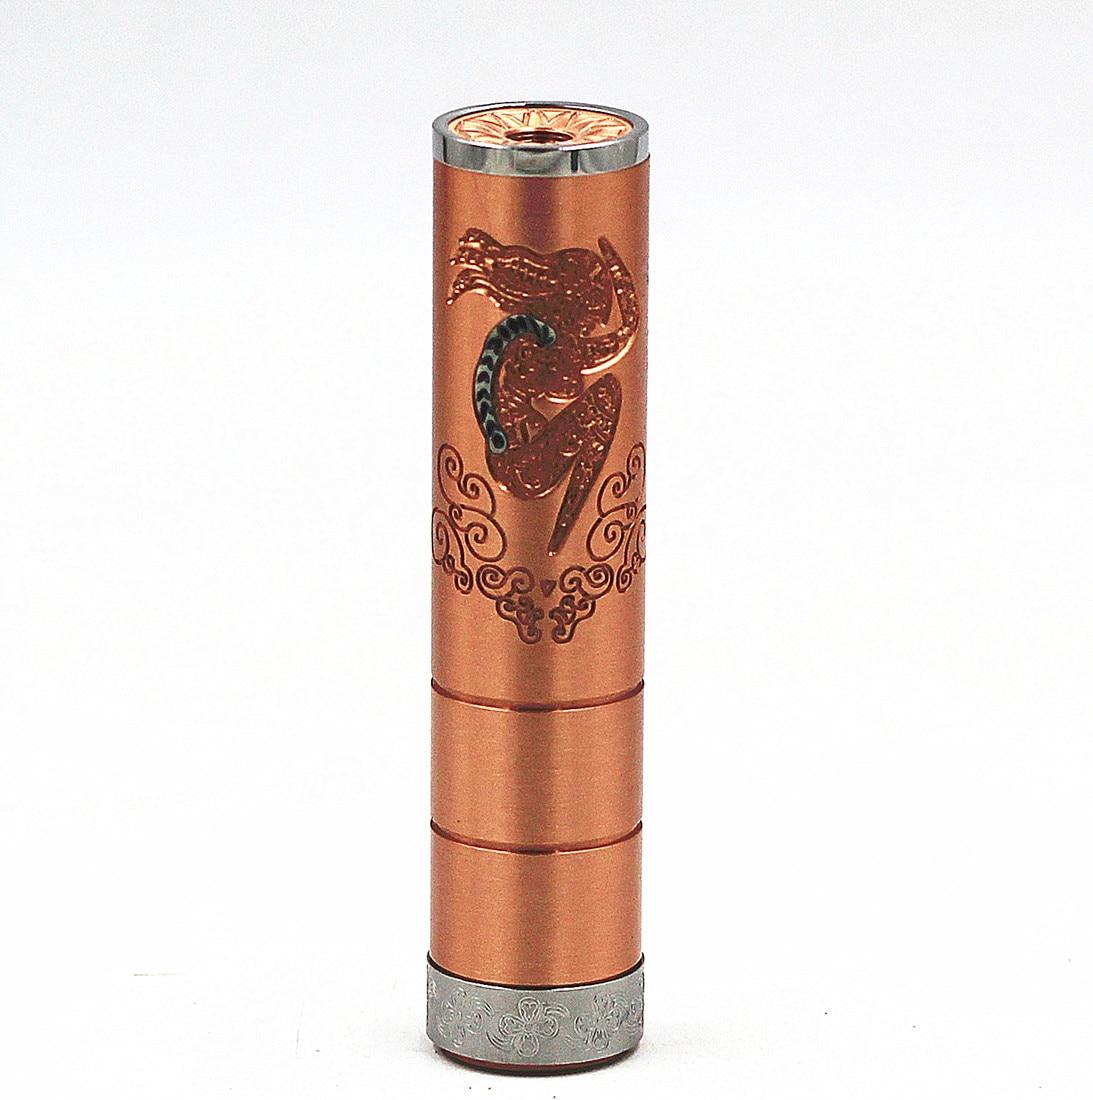 Emma Mech Mod Mechanical 18650 Battery Body Vaporizer Vapor Vape Mod For RDA RBA